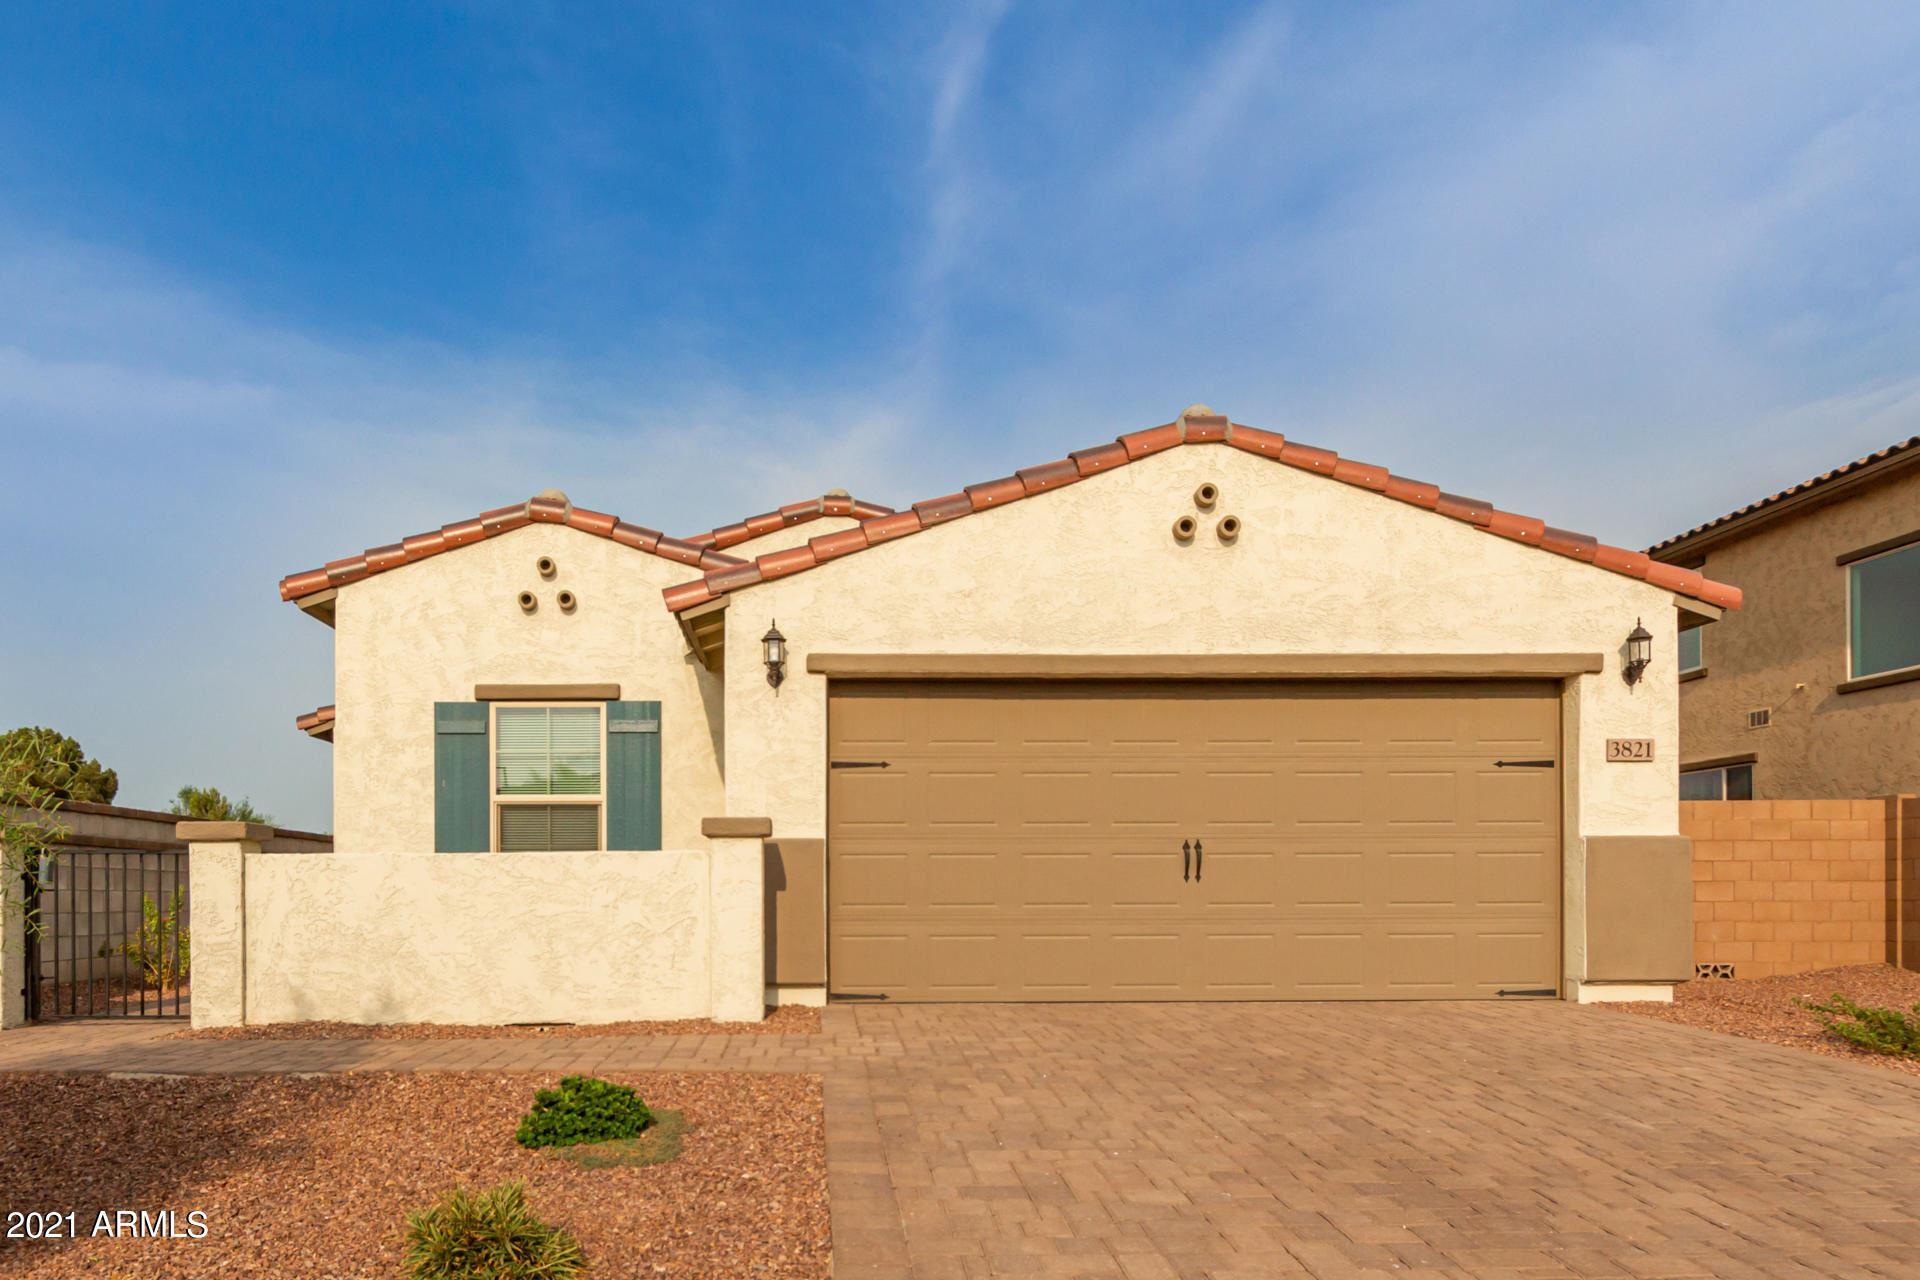 Photo of 3821 S 181ST Lane, Goodyear, AZ 85338 (MLS # 6269050)